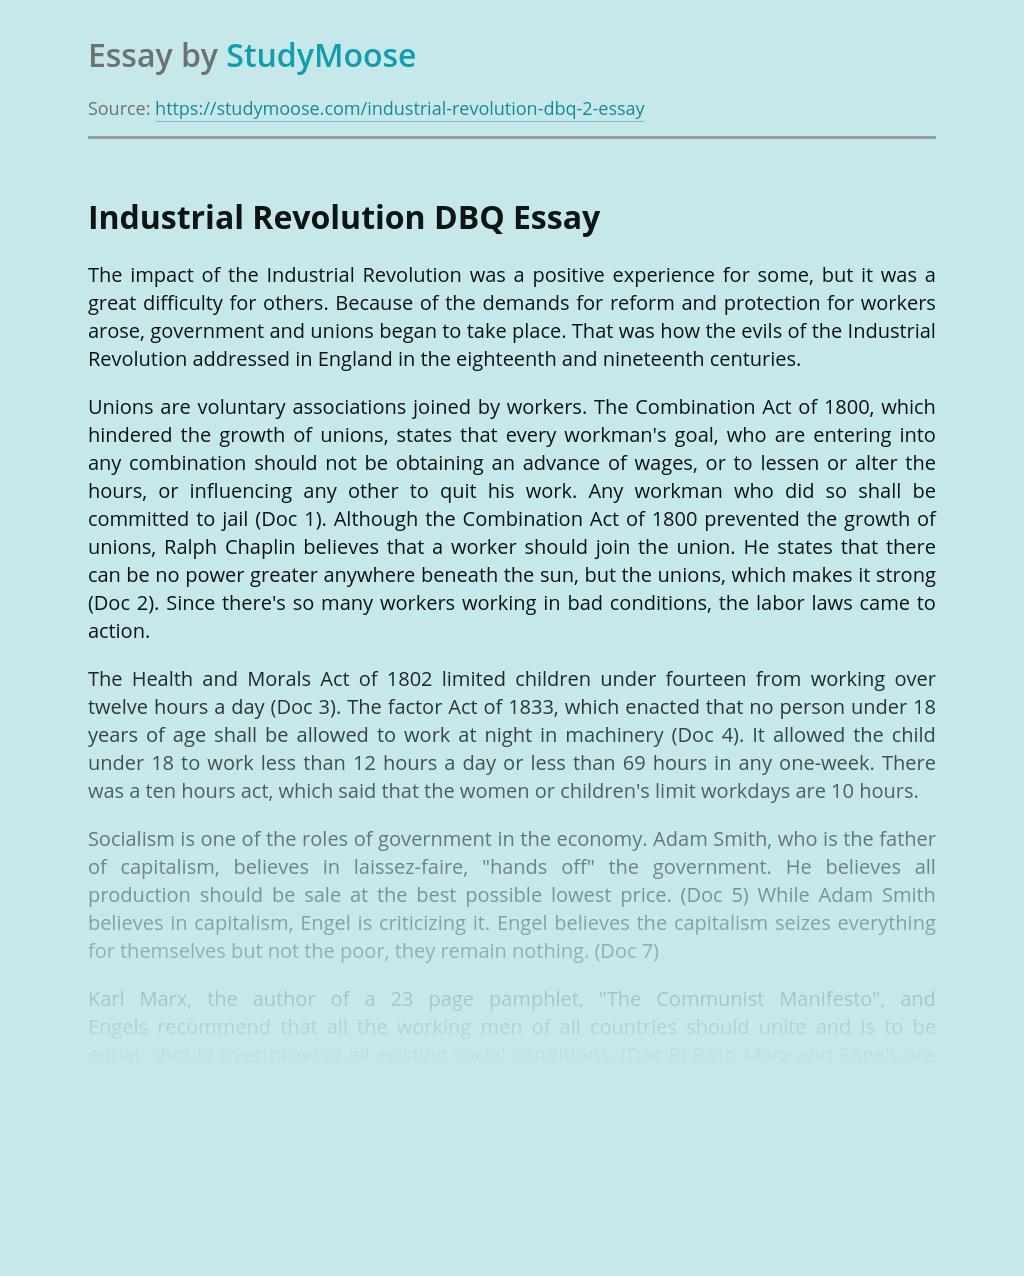 Industrial Revolution DBQ